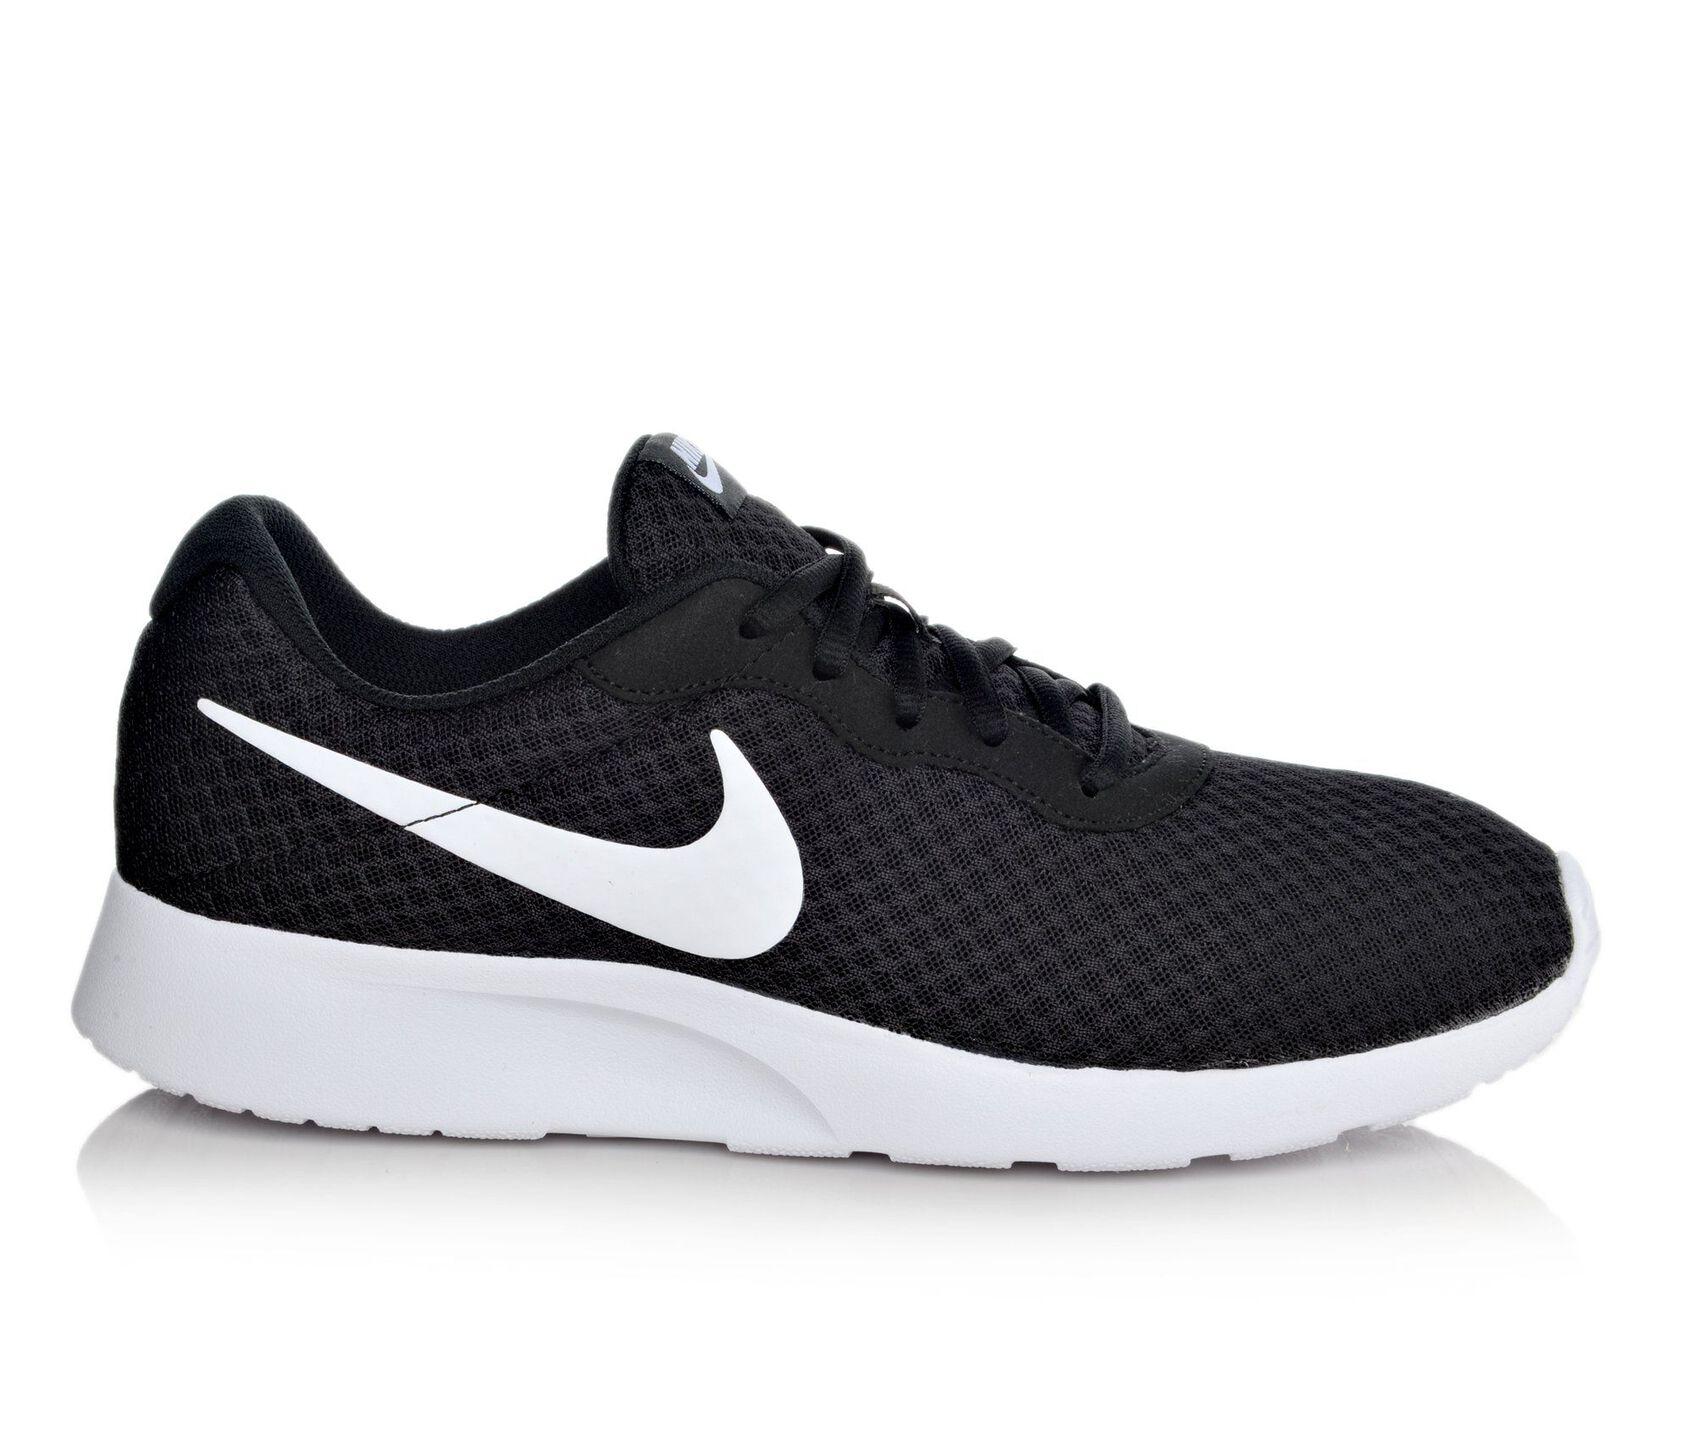 f079244d9e24f ... Nike Tanjun Sneakers. Previous